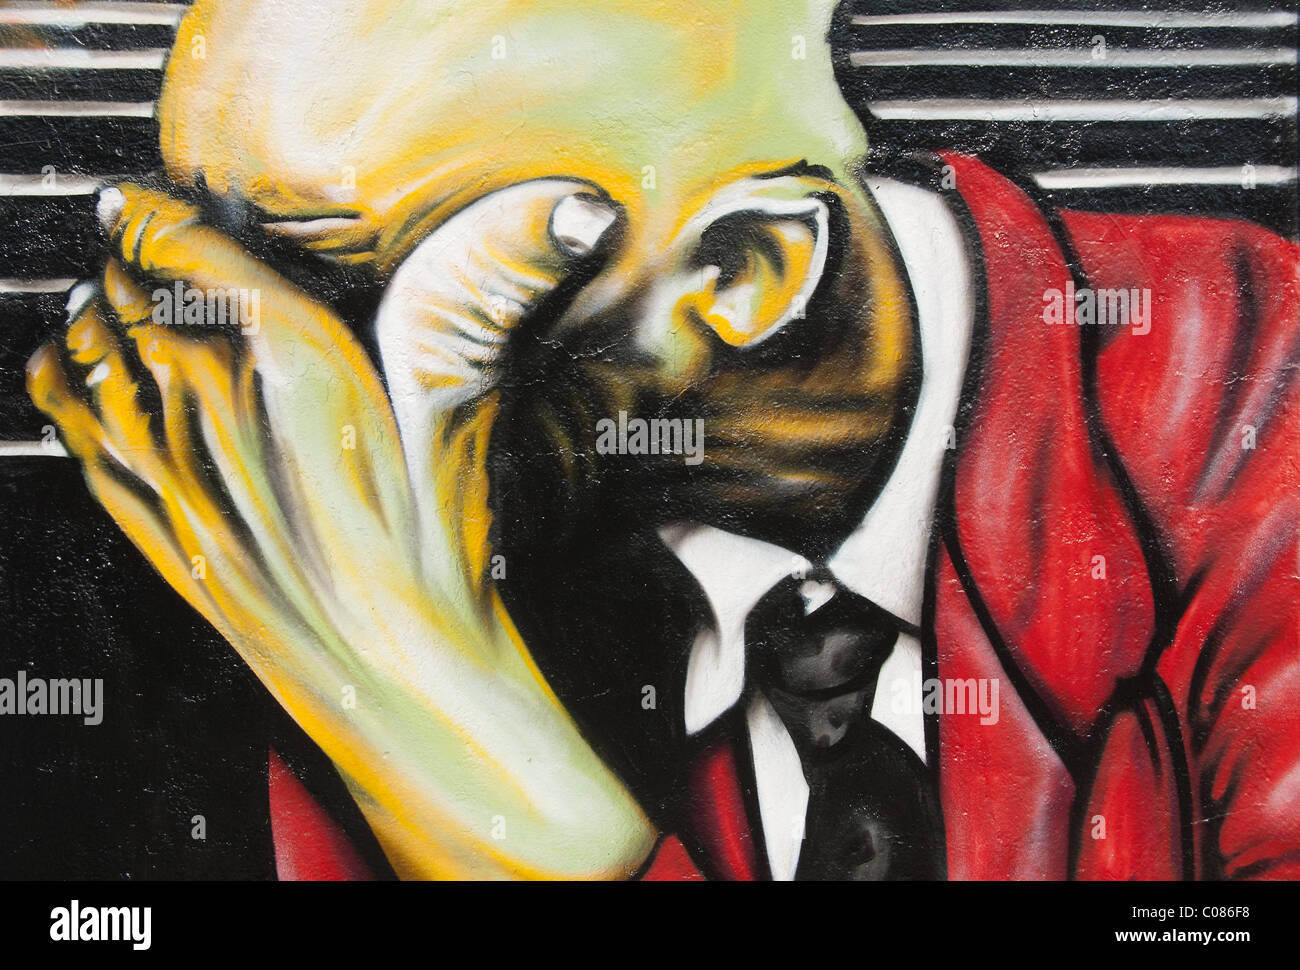 Graffiti wall usa - Graffiti Wall Art Mural In Wynwood District Of Miami Florida Usa